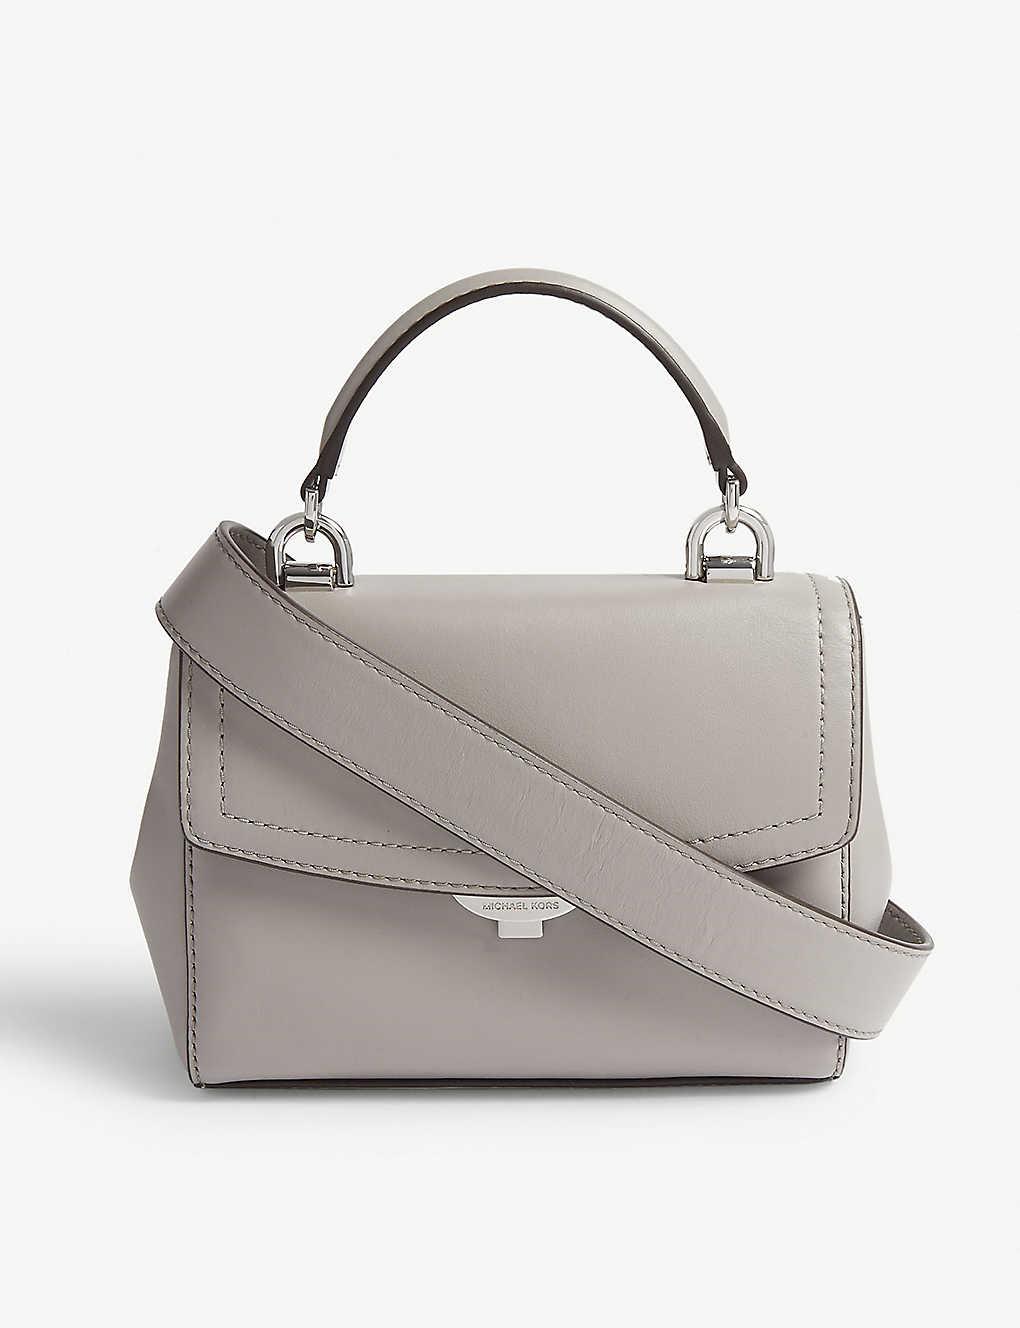 d0fa14607fdd2 MICHAEL MICHAEL KORS - Ava extra small leather cross-body bag ...